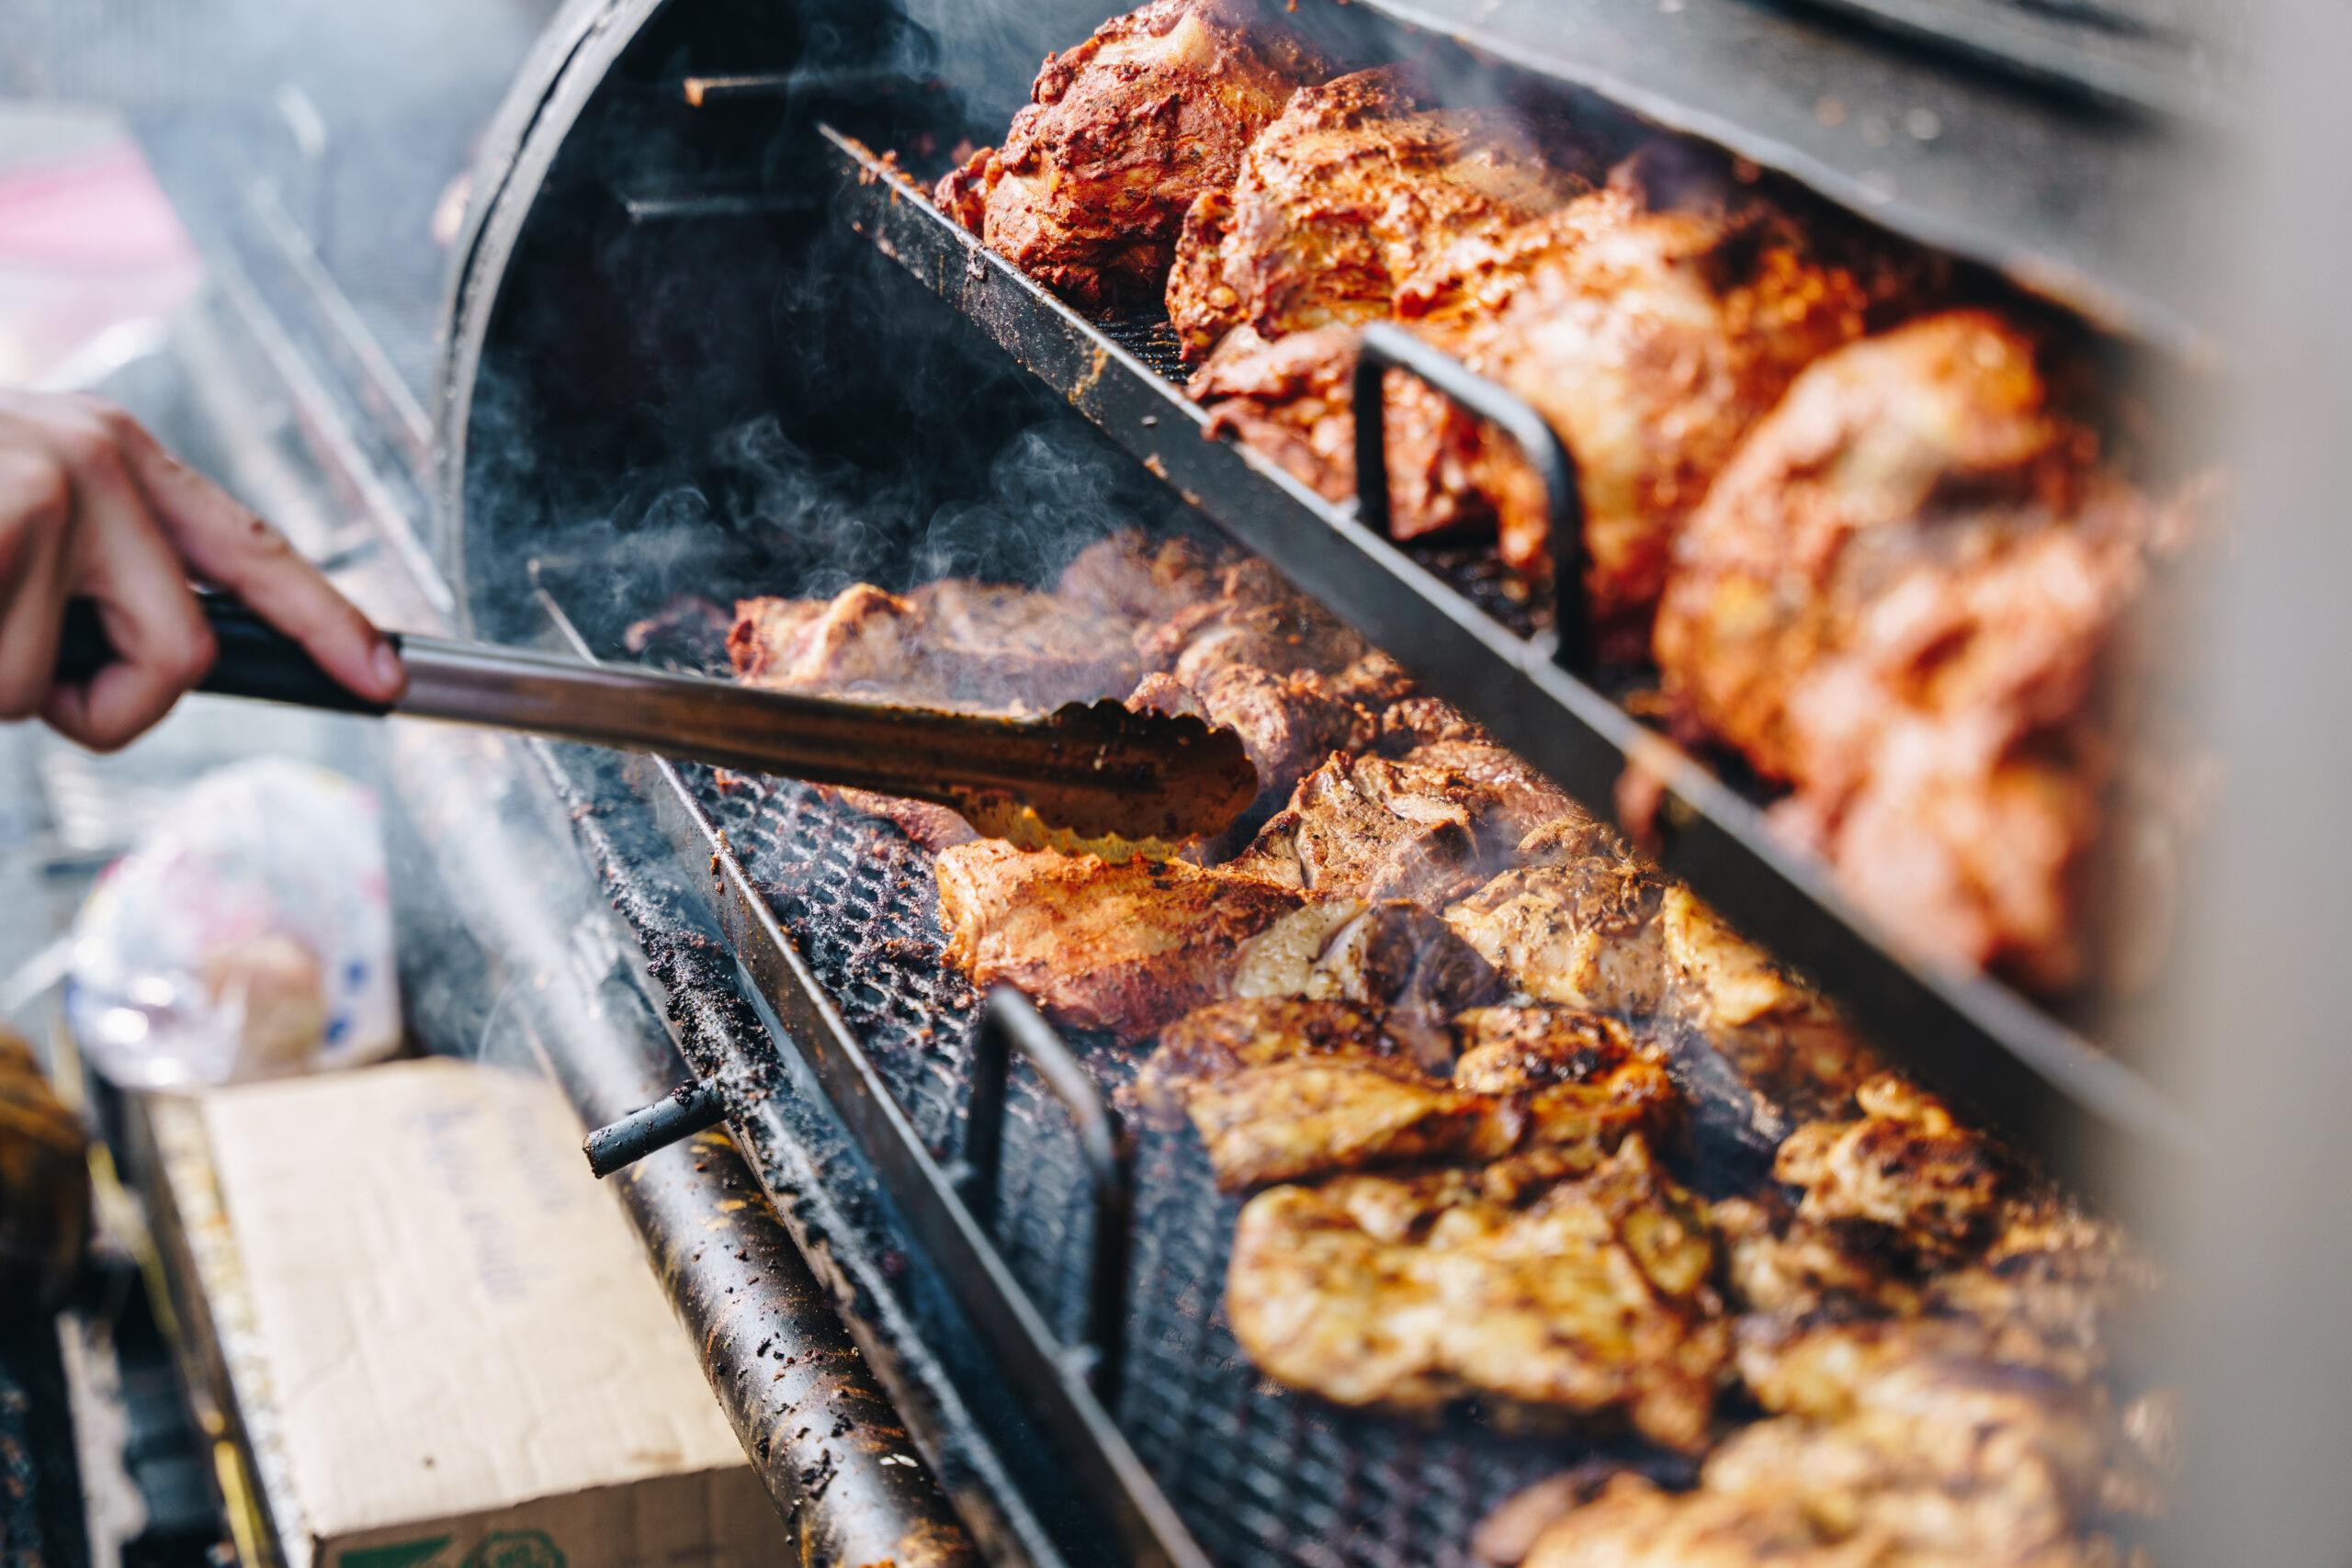 Food on BBQ Grill